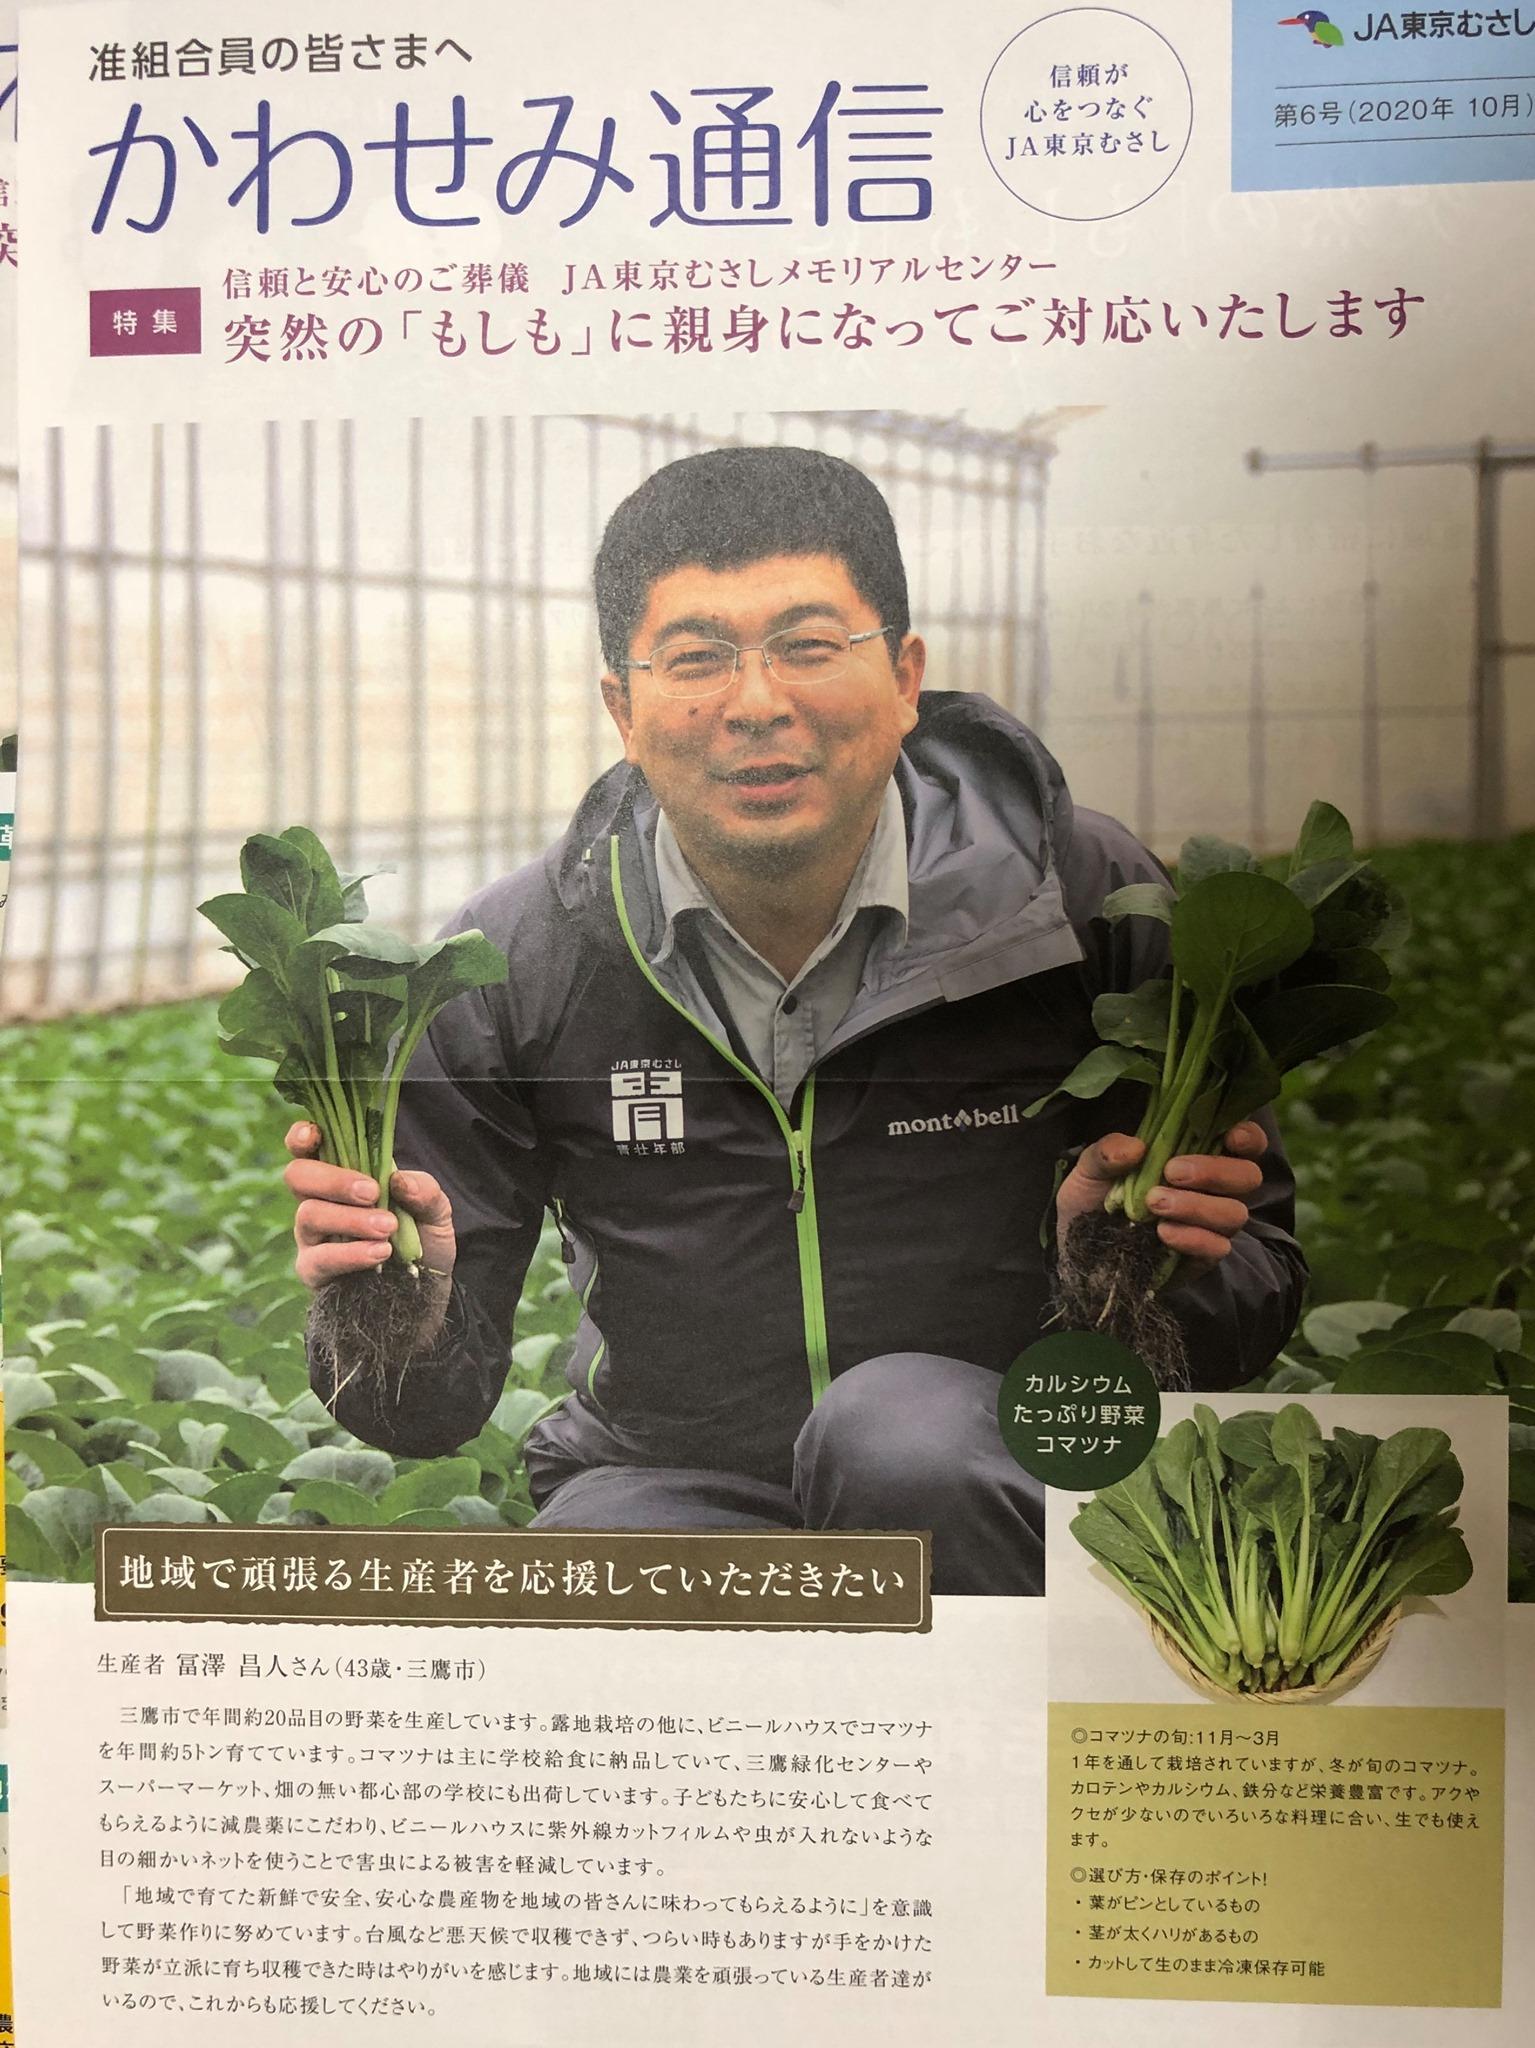 JA東京むさし準会員宛の『かわせみ通信』が届きました。